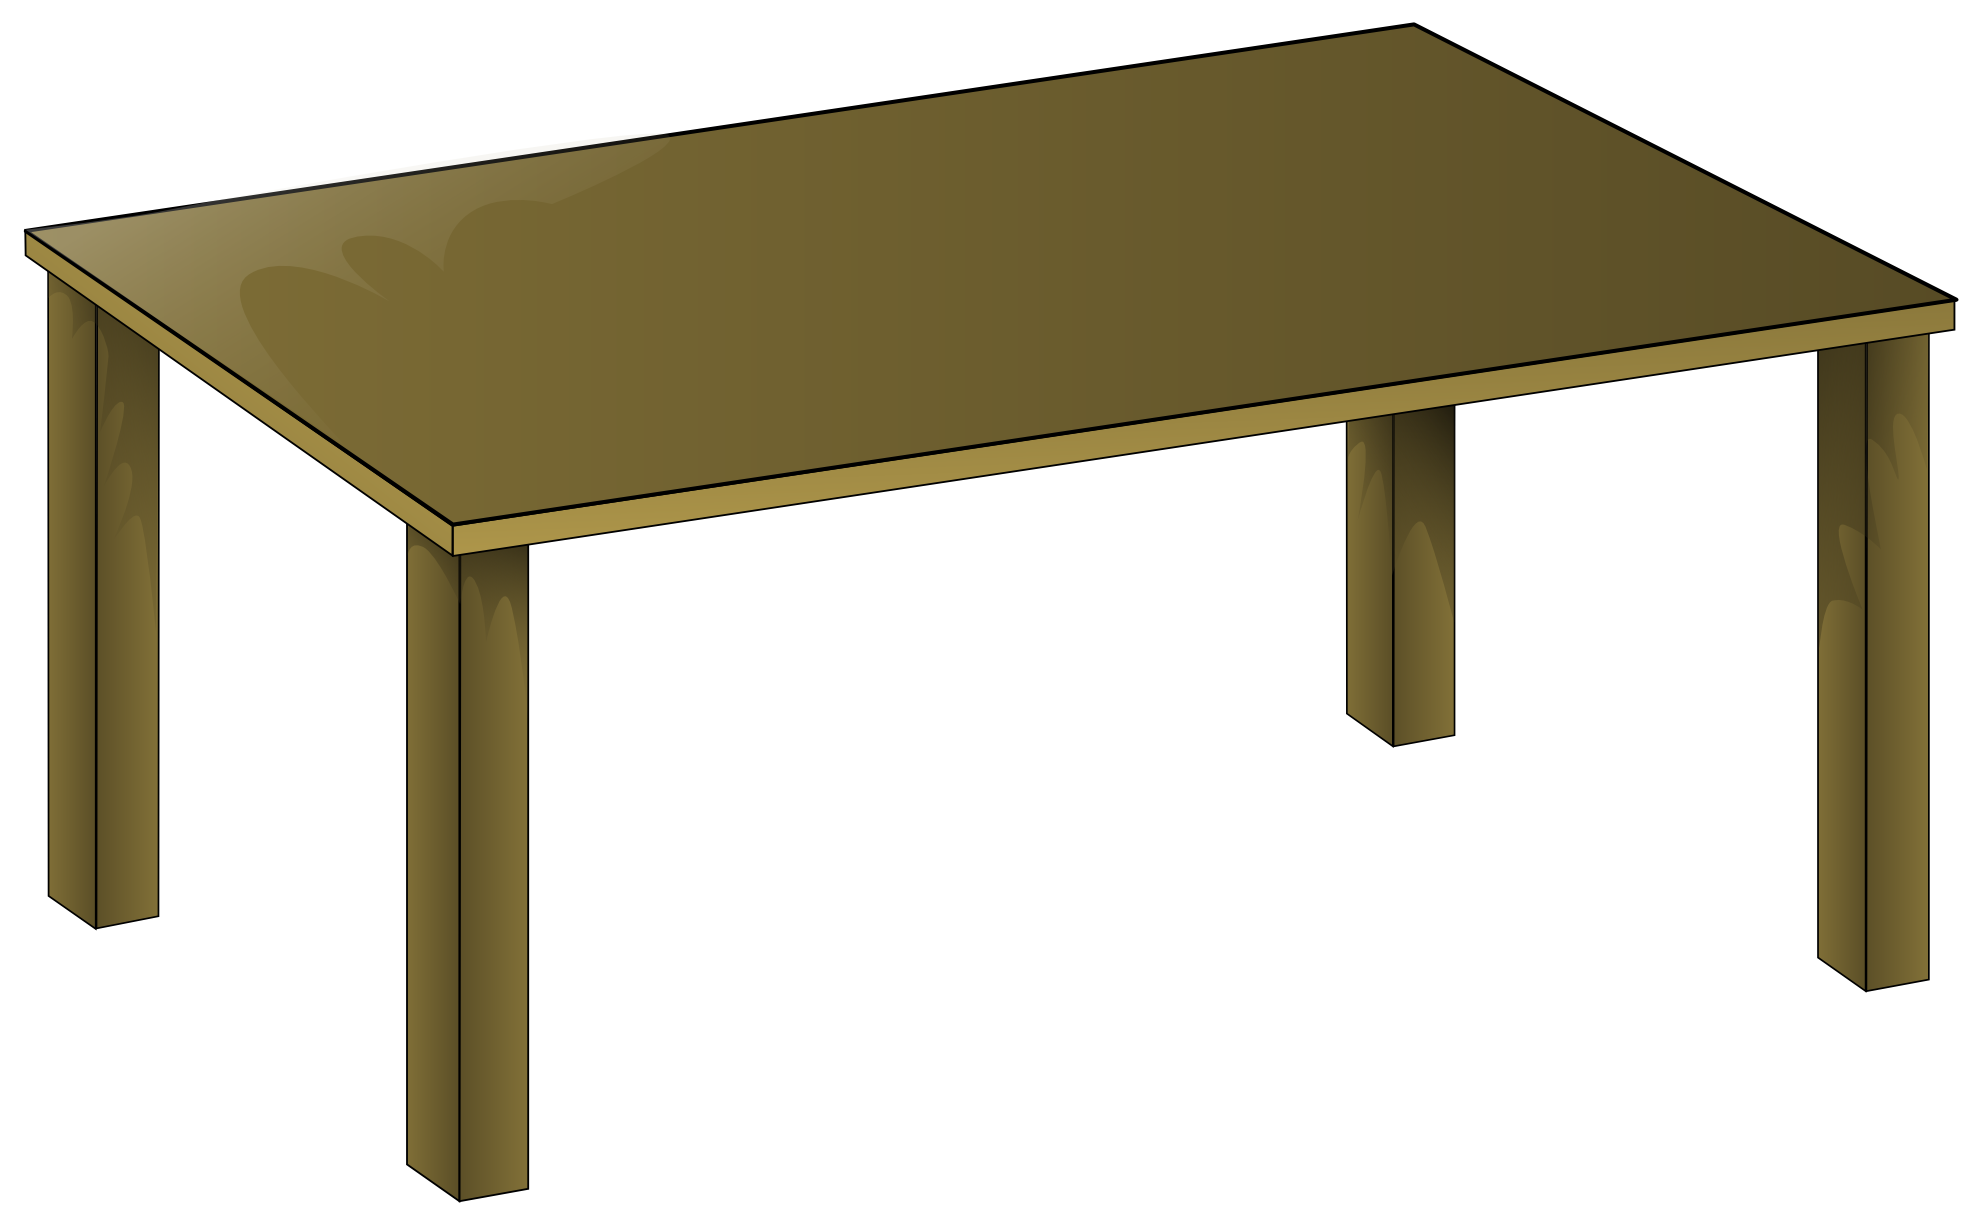 Desk clipart desk drawer. Table panda free images